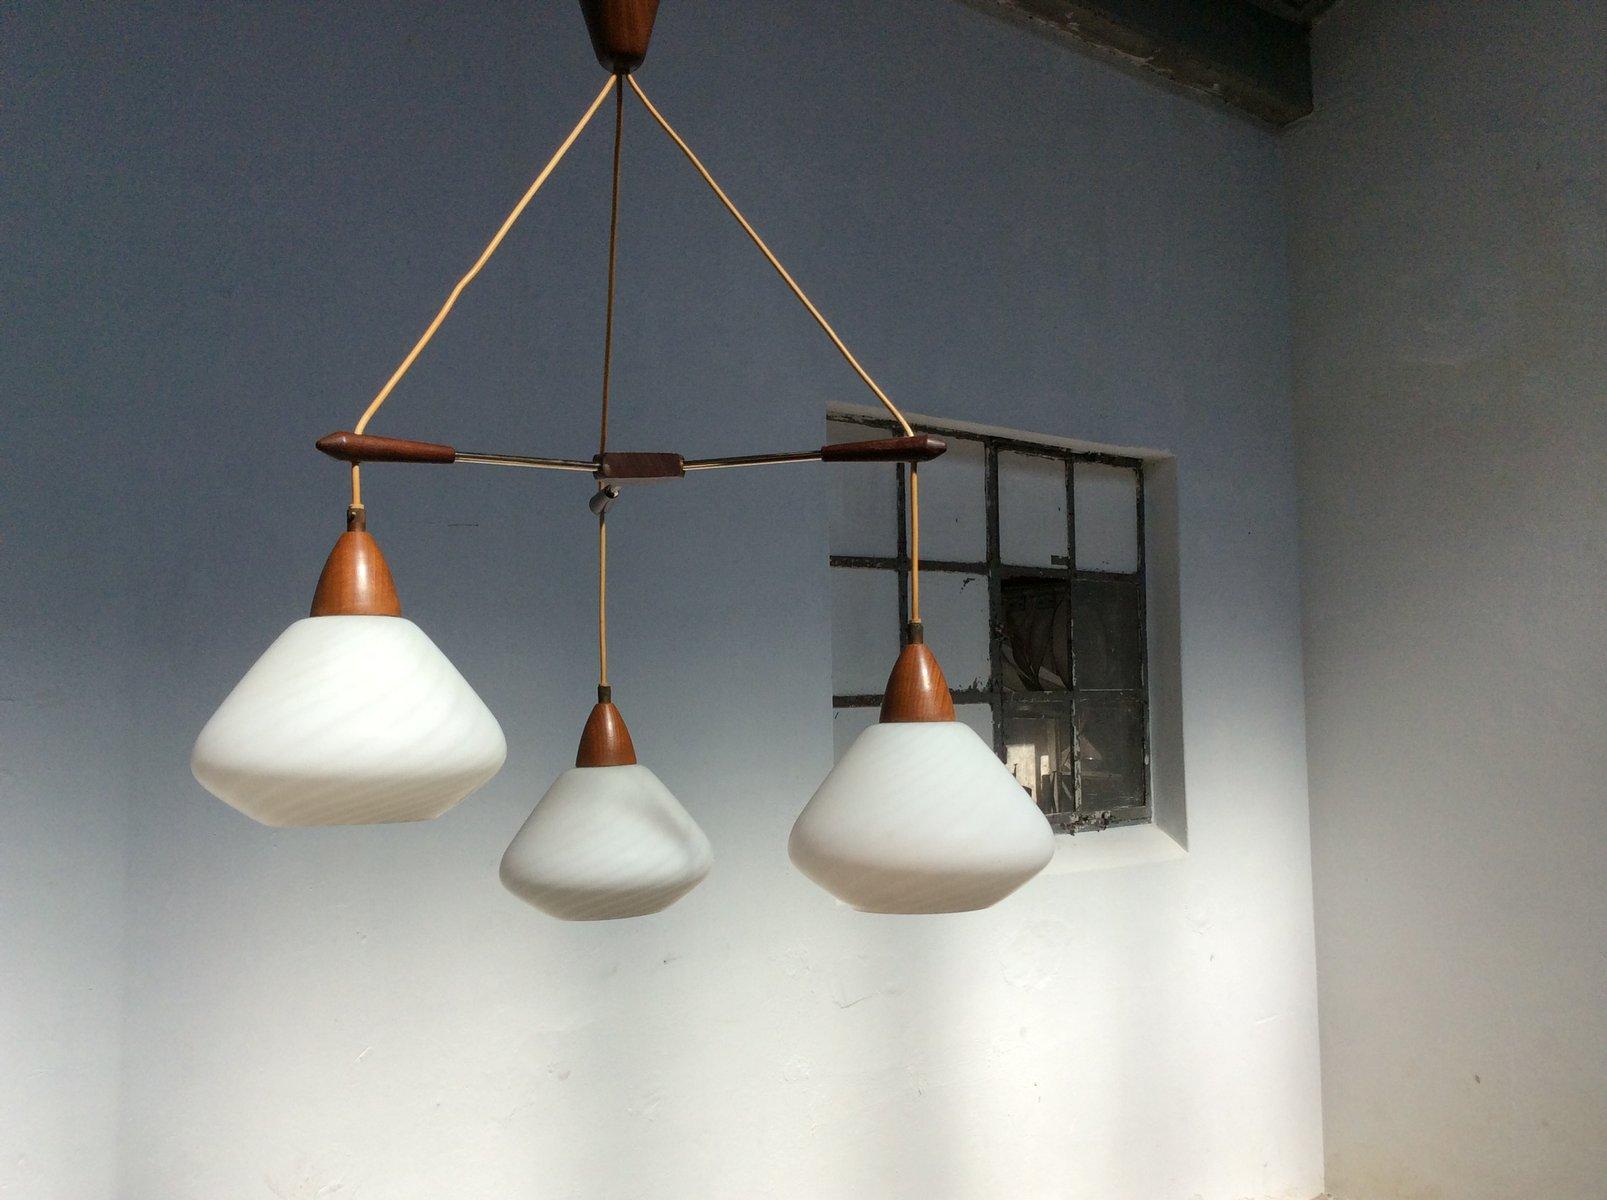 mid century scandinavian pendant light 1950s for sale at. Black Bedroom Furniture Sets. Home Design Ideas